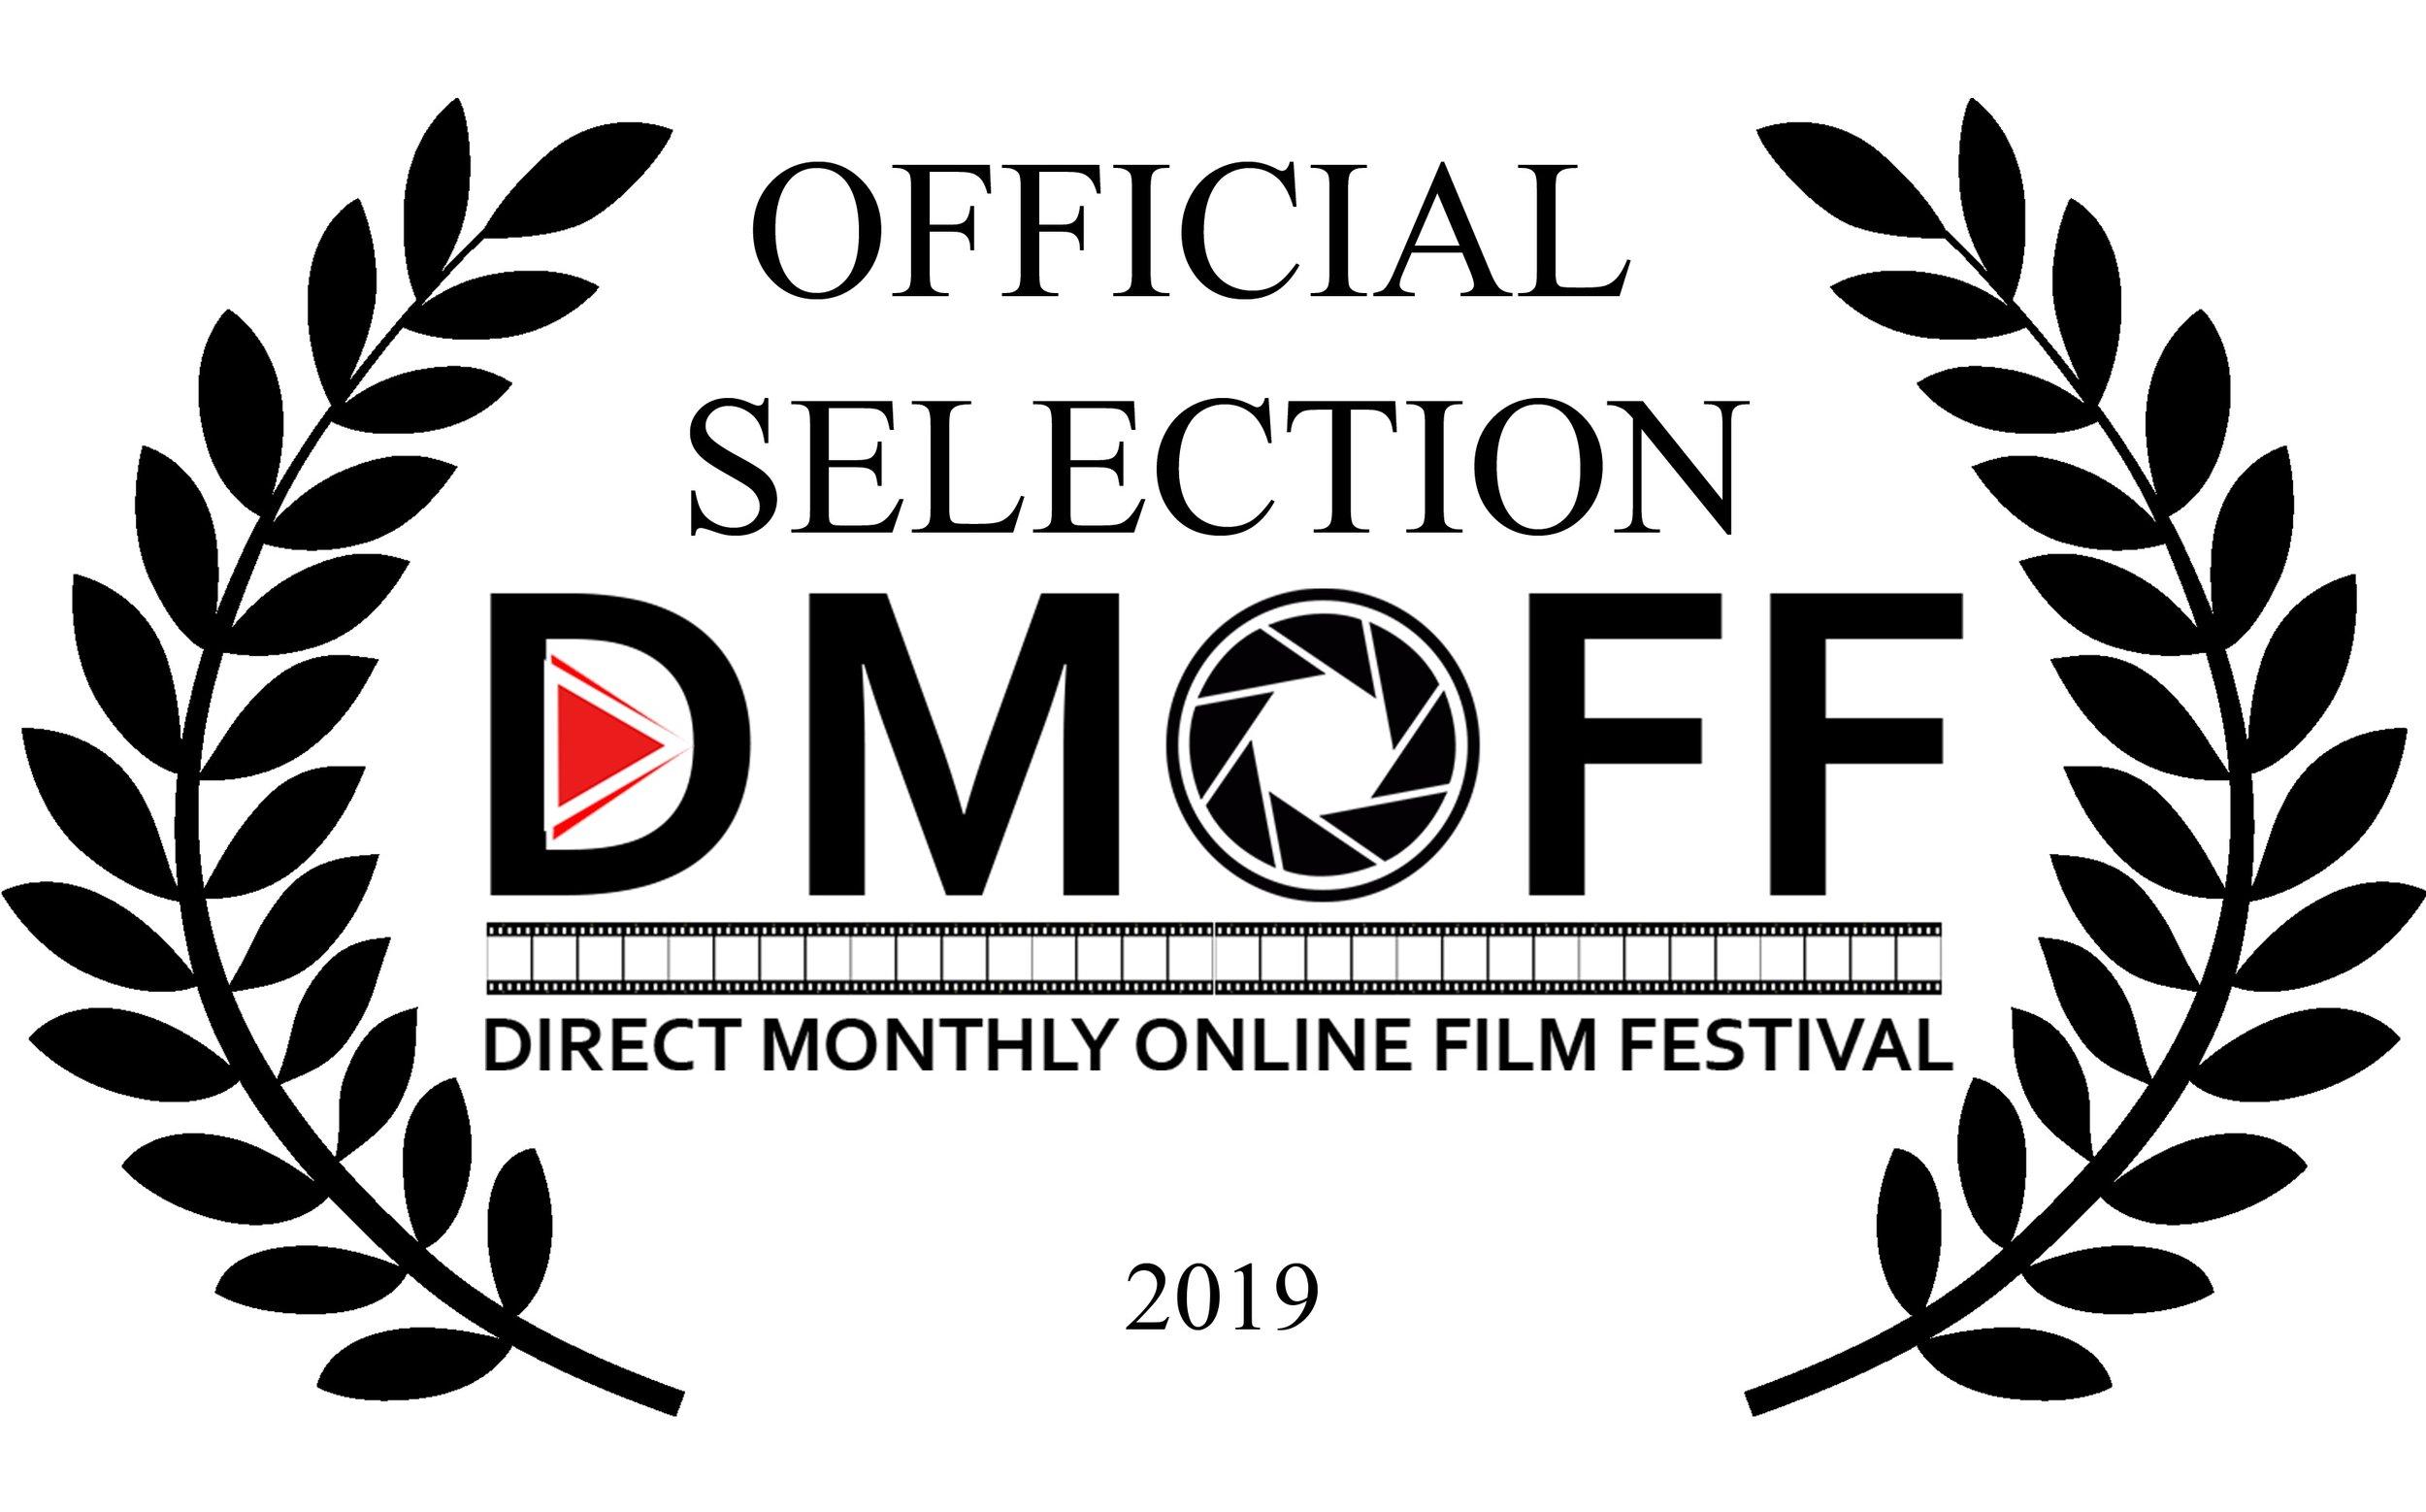 Malsano_Official Selection DMOFF Laurel copy.jpg